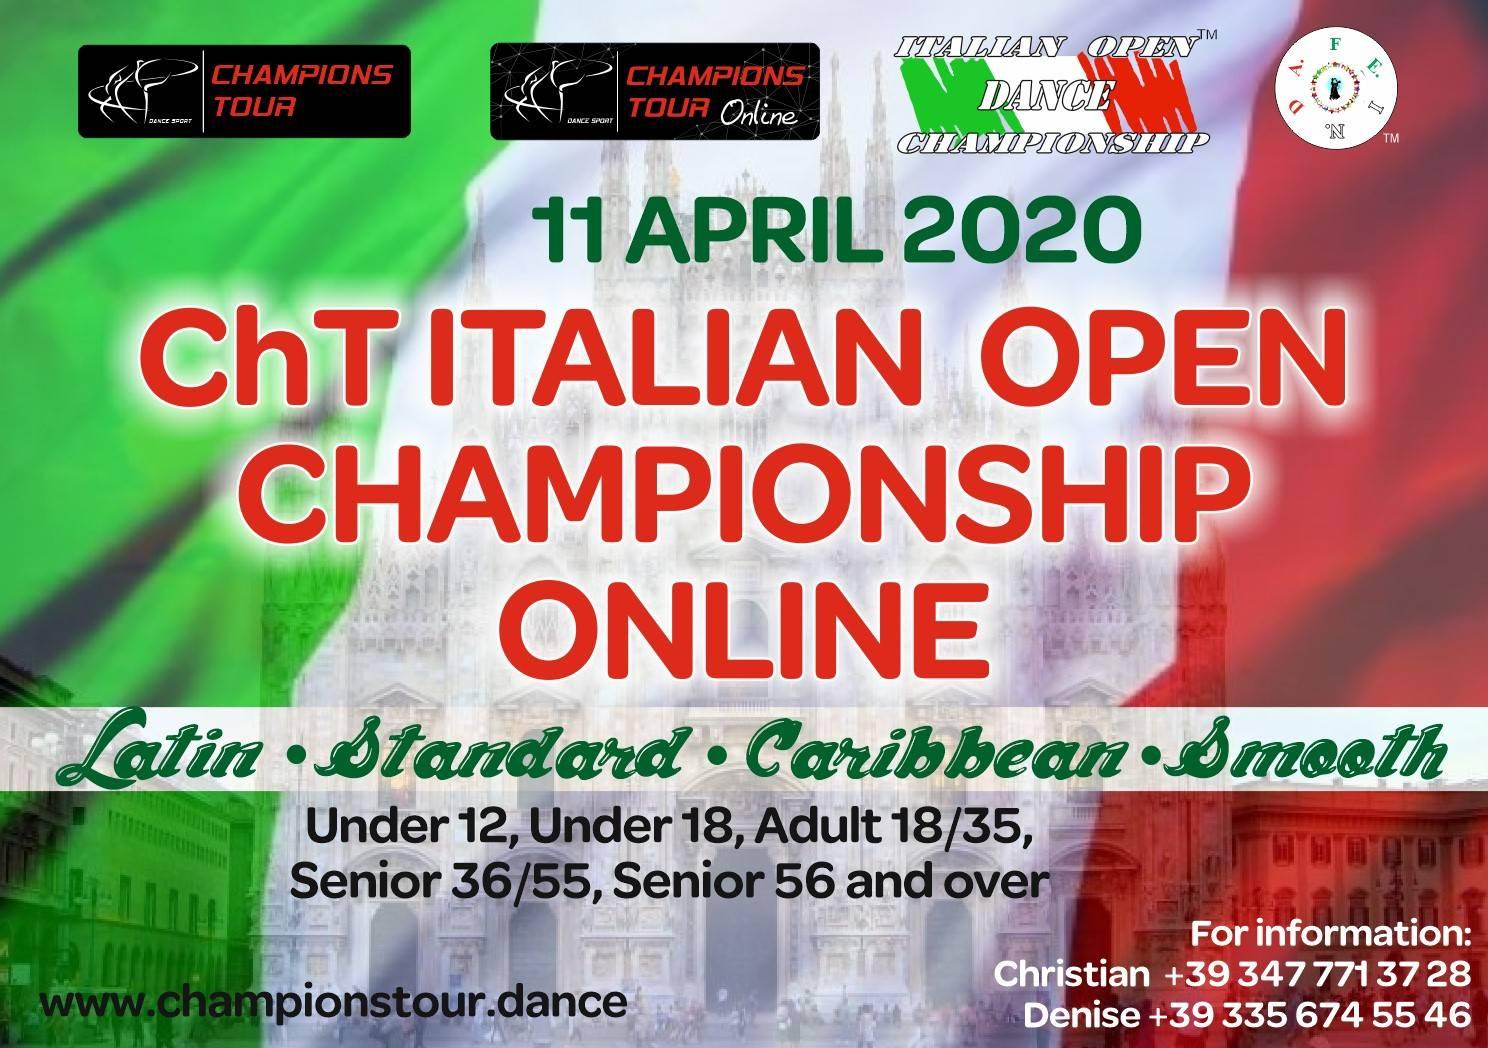 ChT Italian Open Championship Online